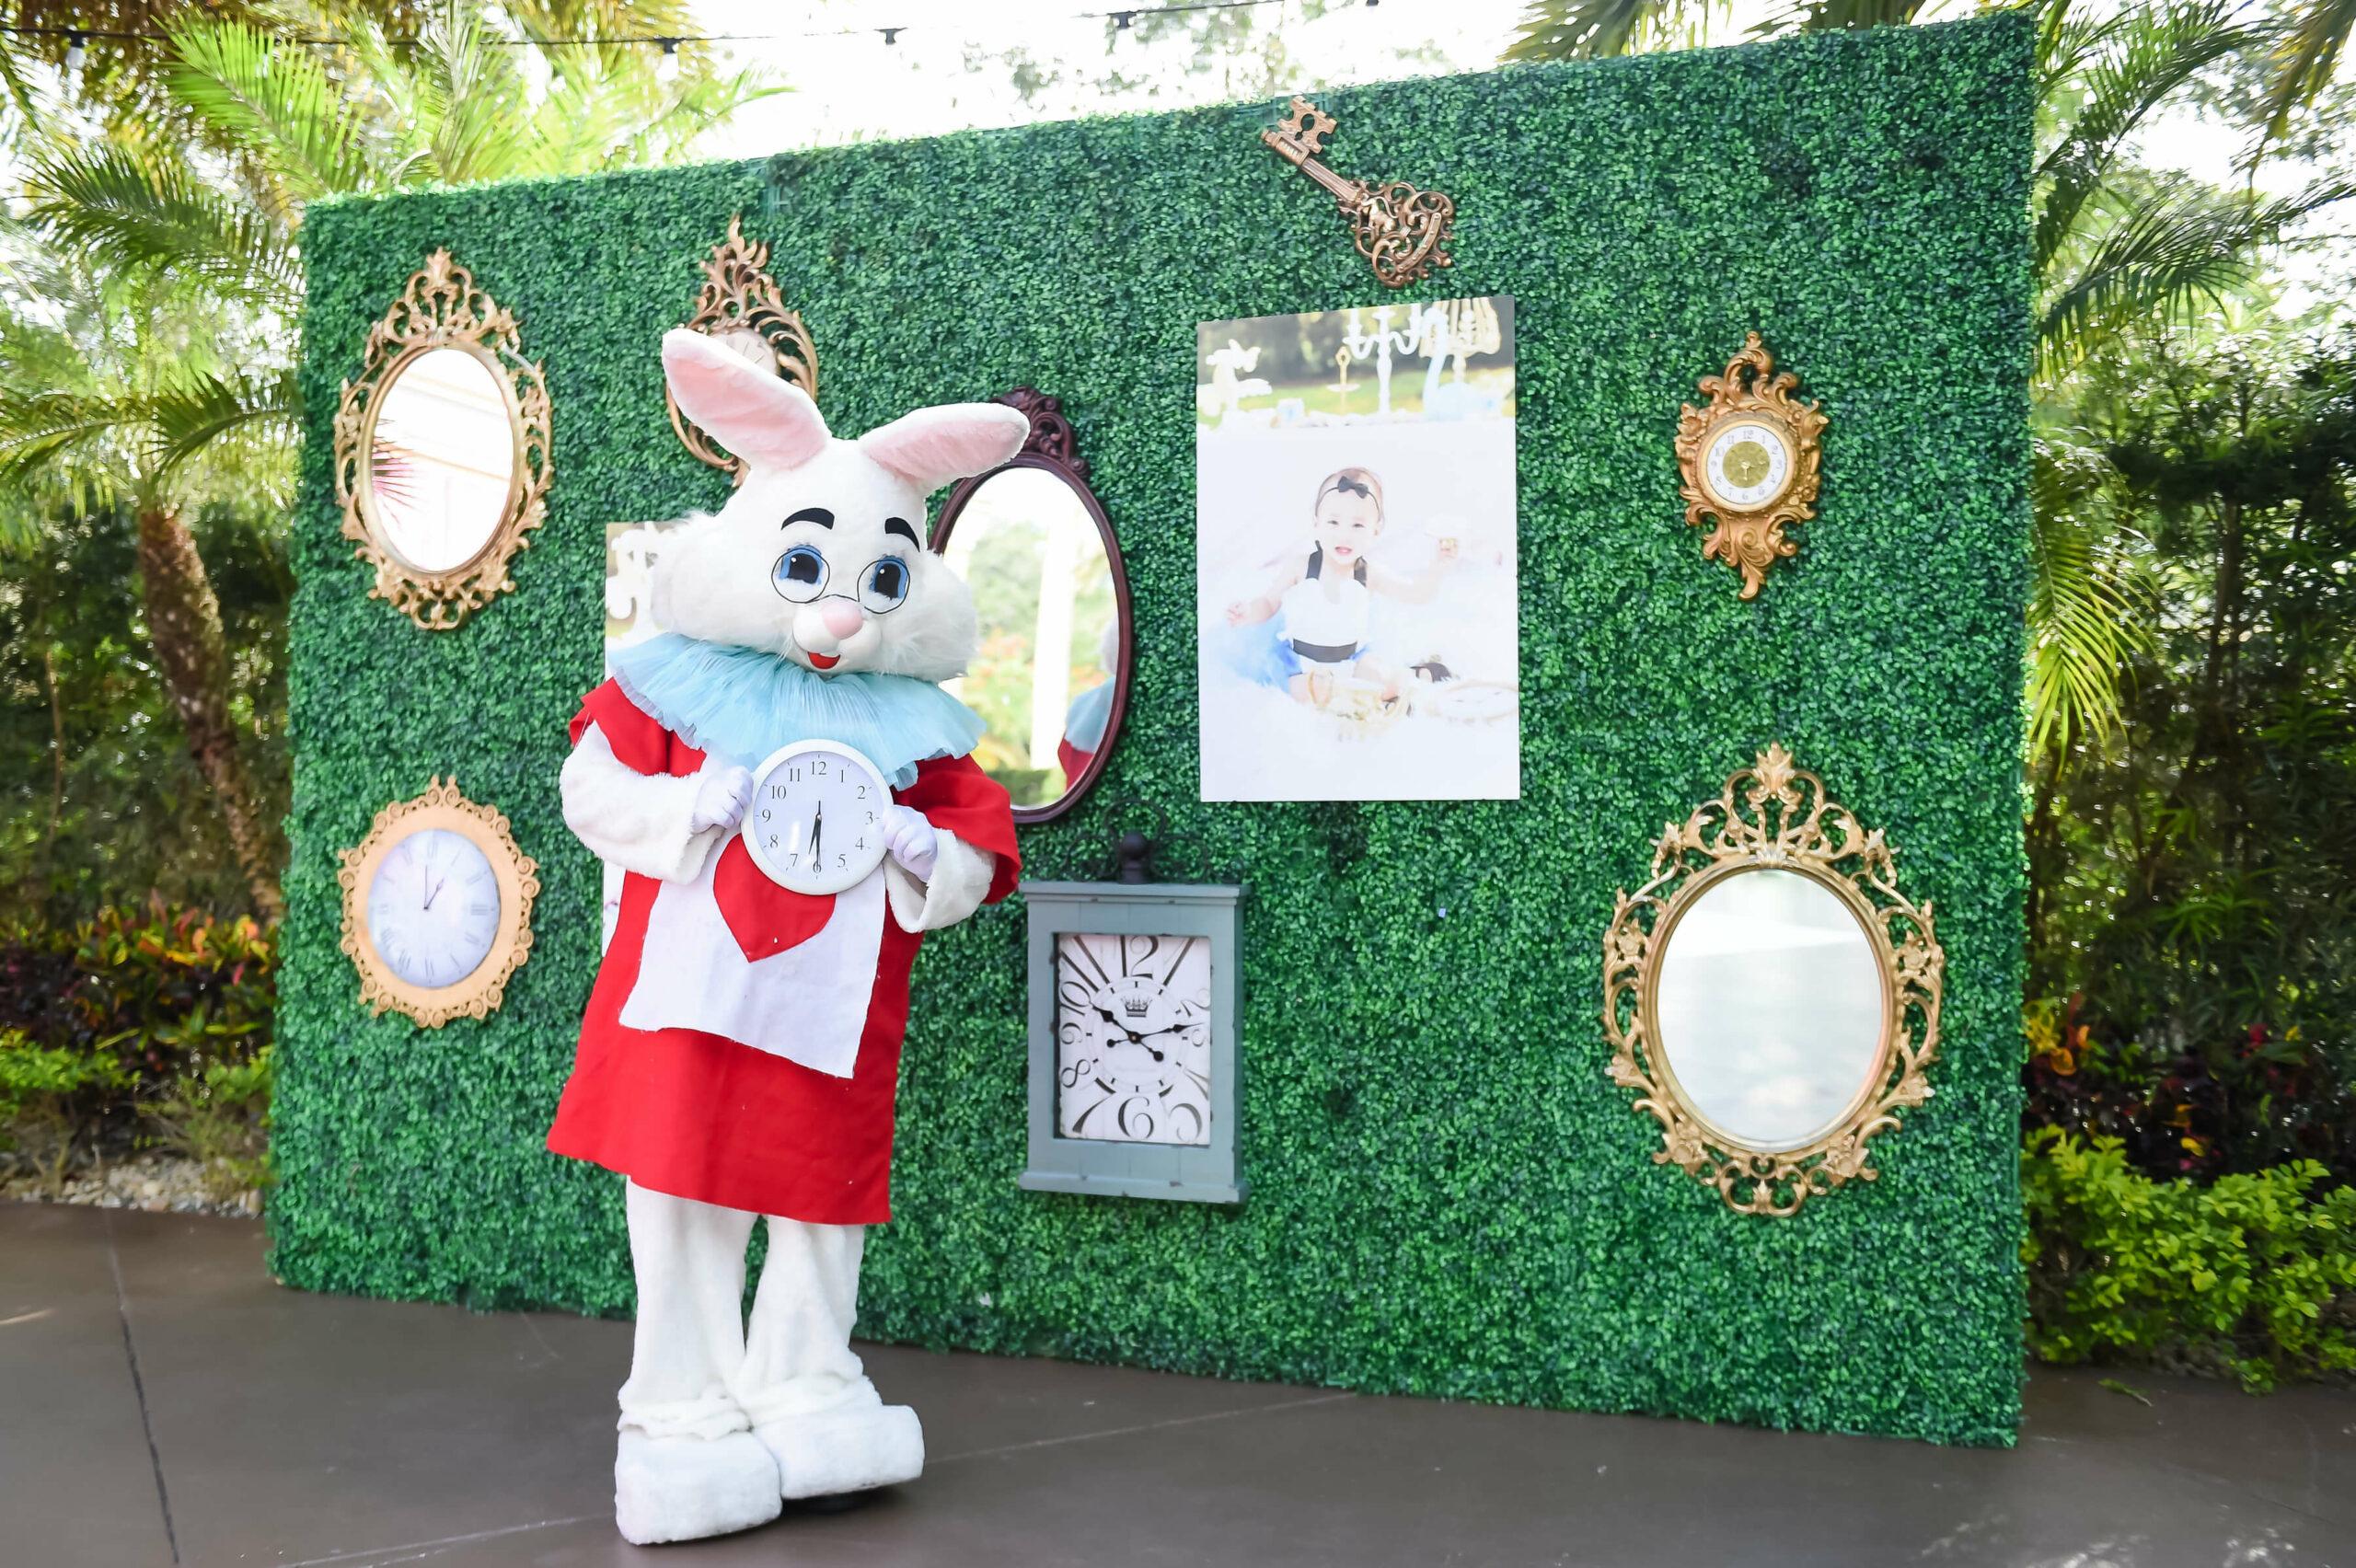 Graycen's Alice and Wonderland 1st Birthday